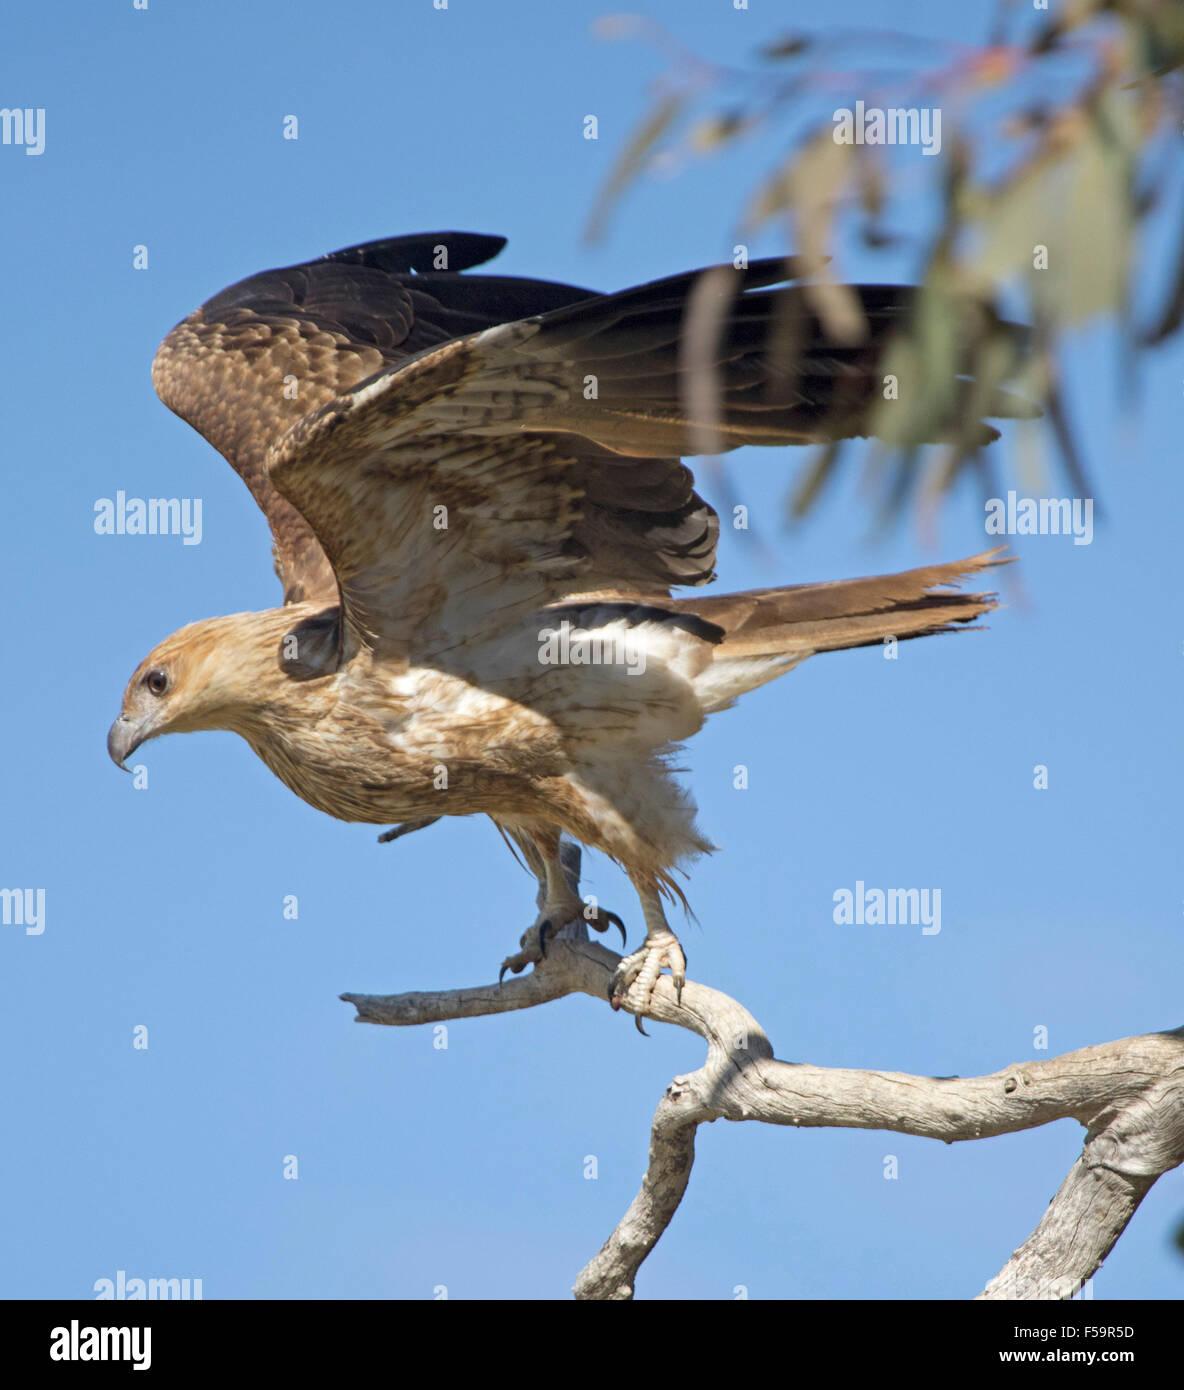 Whistling kite, Haliastur sphenurus, launching into flight from dead tree, wings raised against blue sky in outback Australia Stock Photo